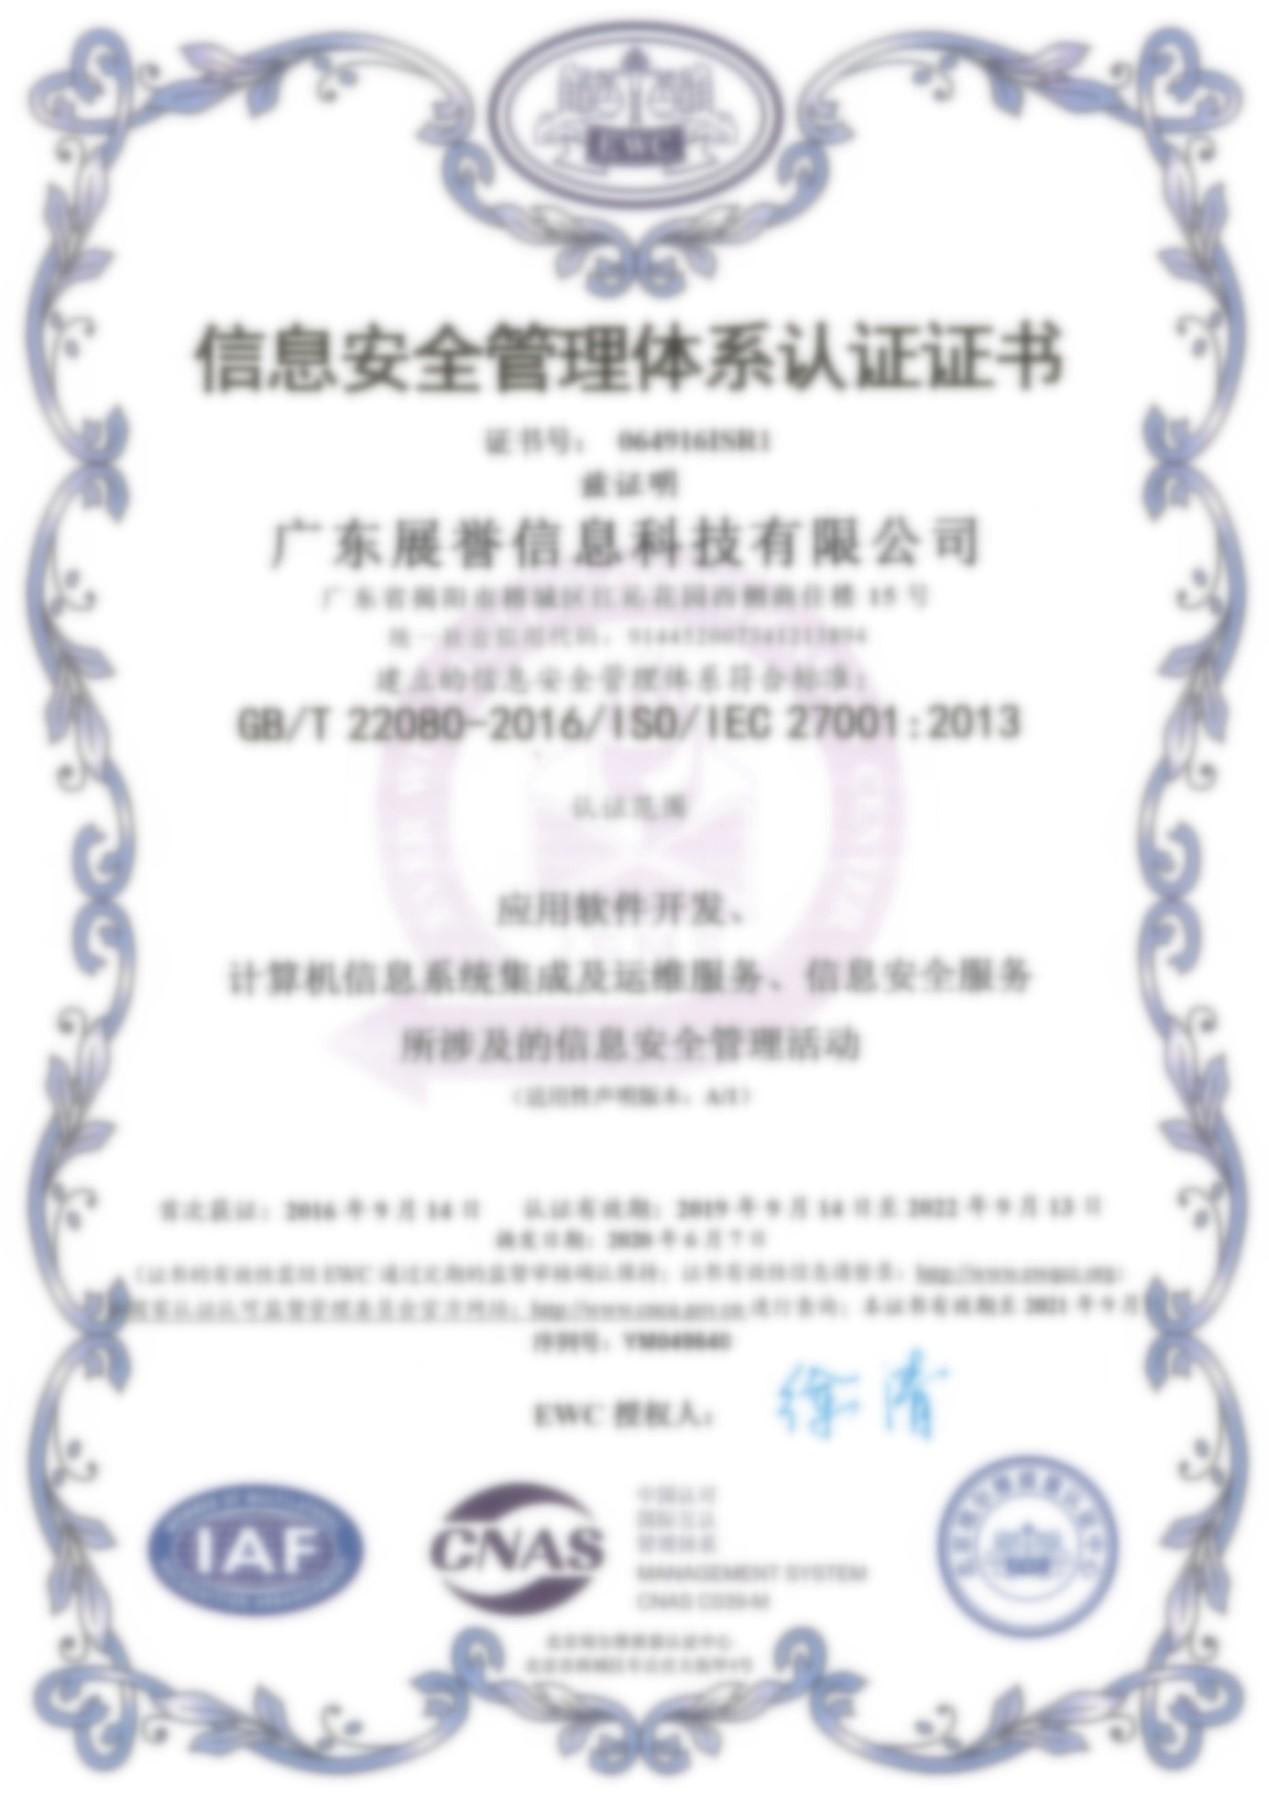 title='信息安全管理体系认证证书'